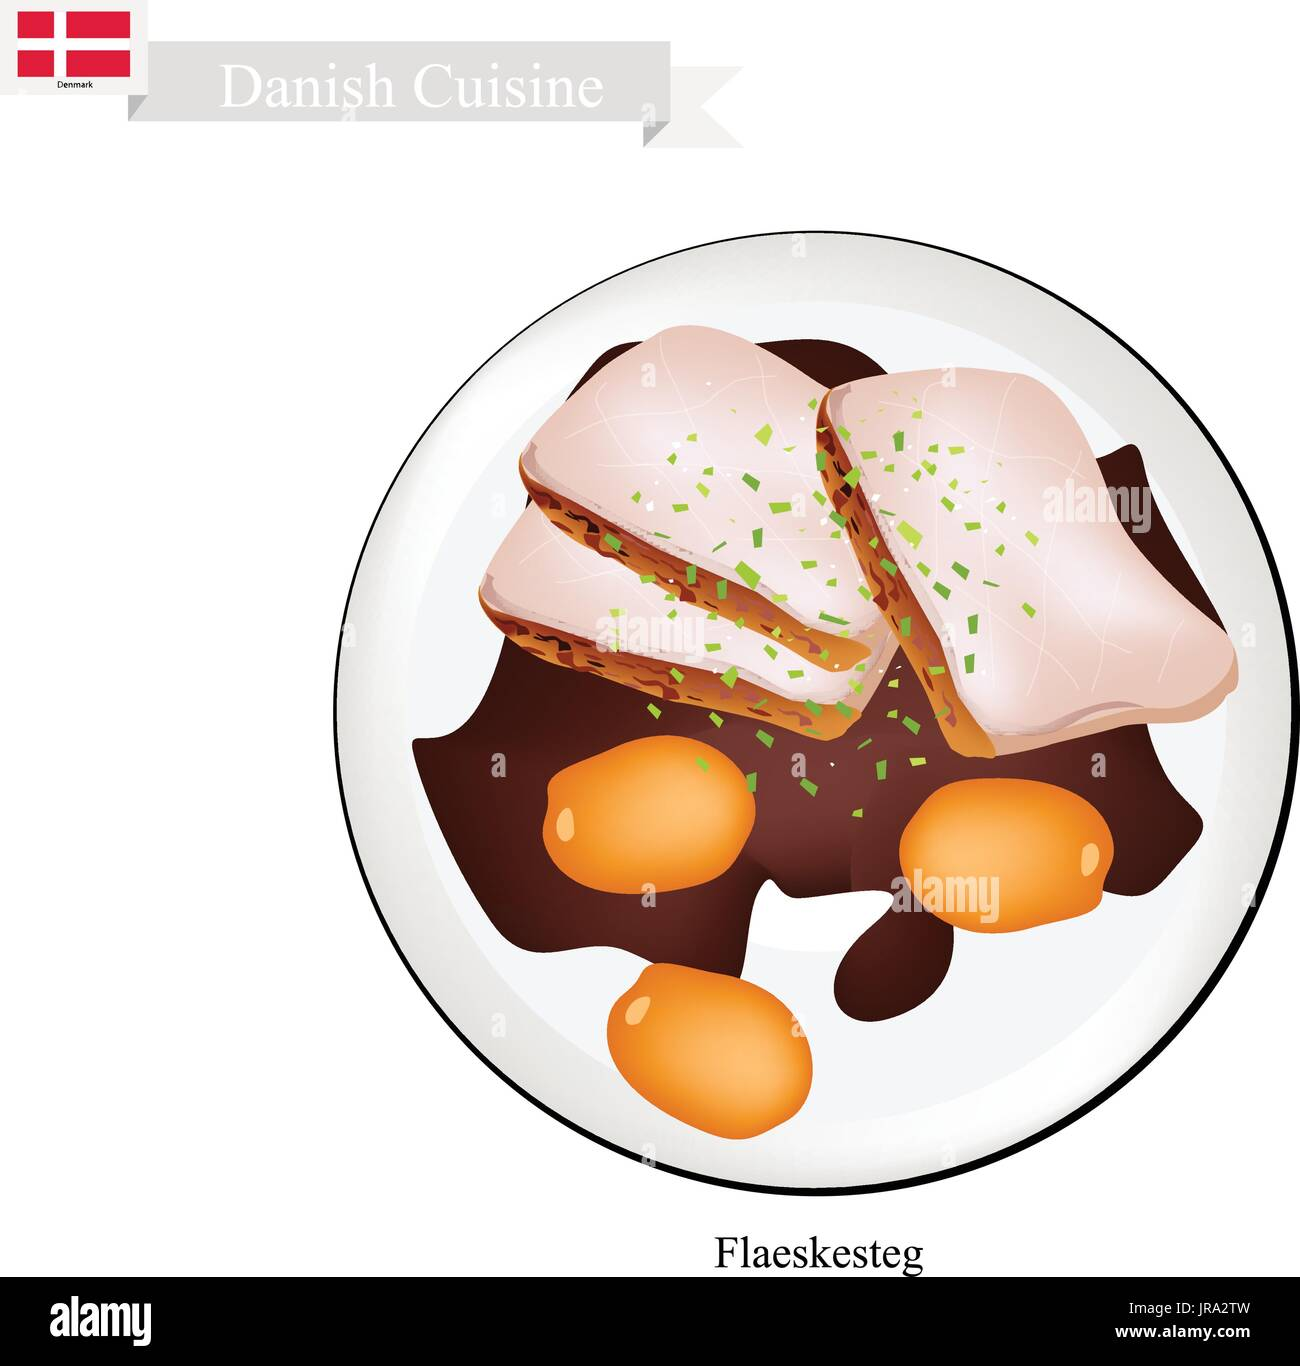 Danish Food Flag Stock Photos & Danish Food Flag Stock ...